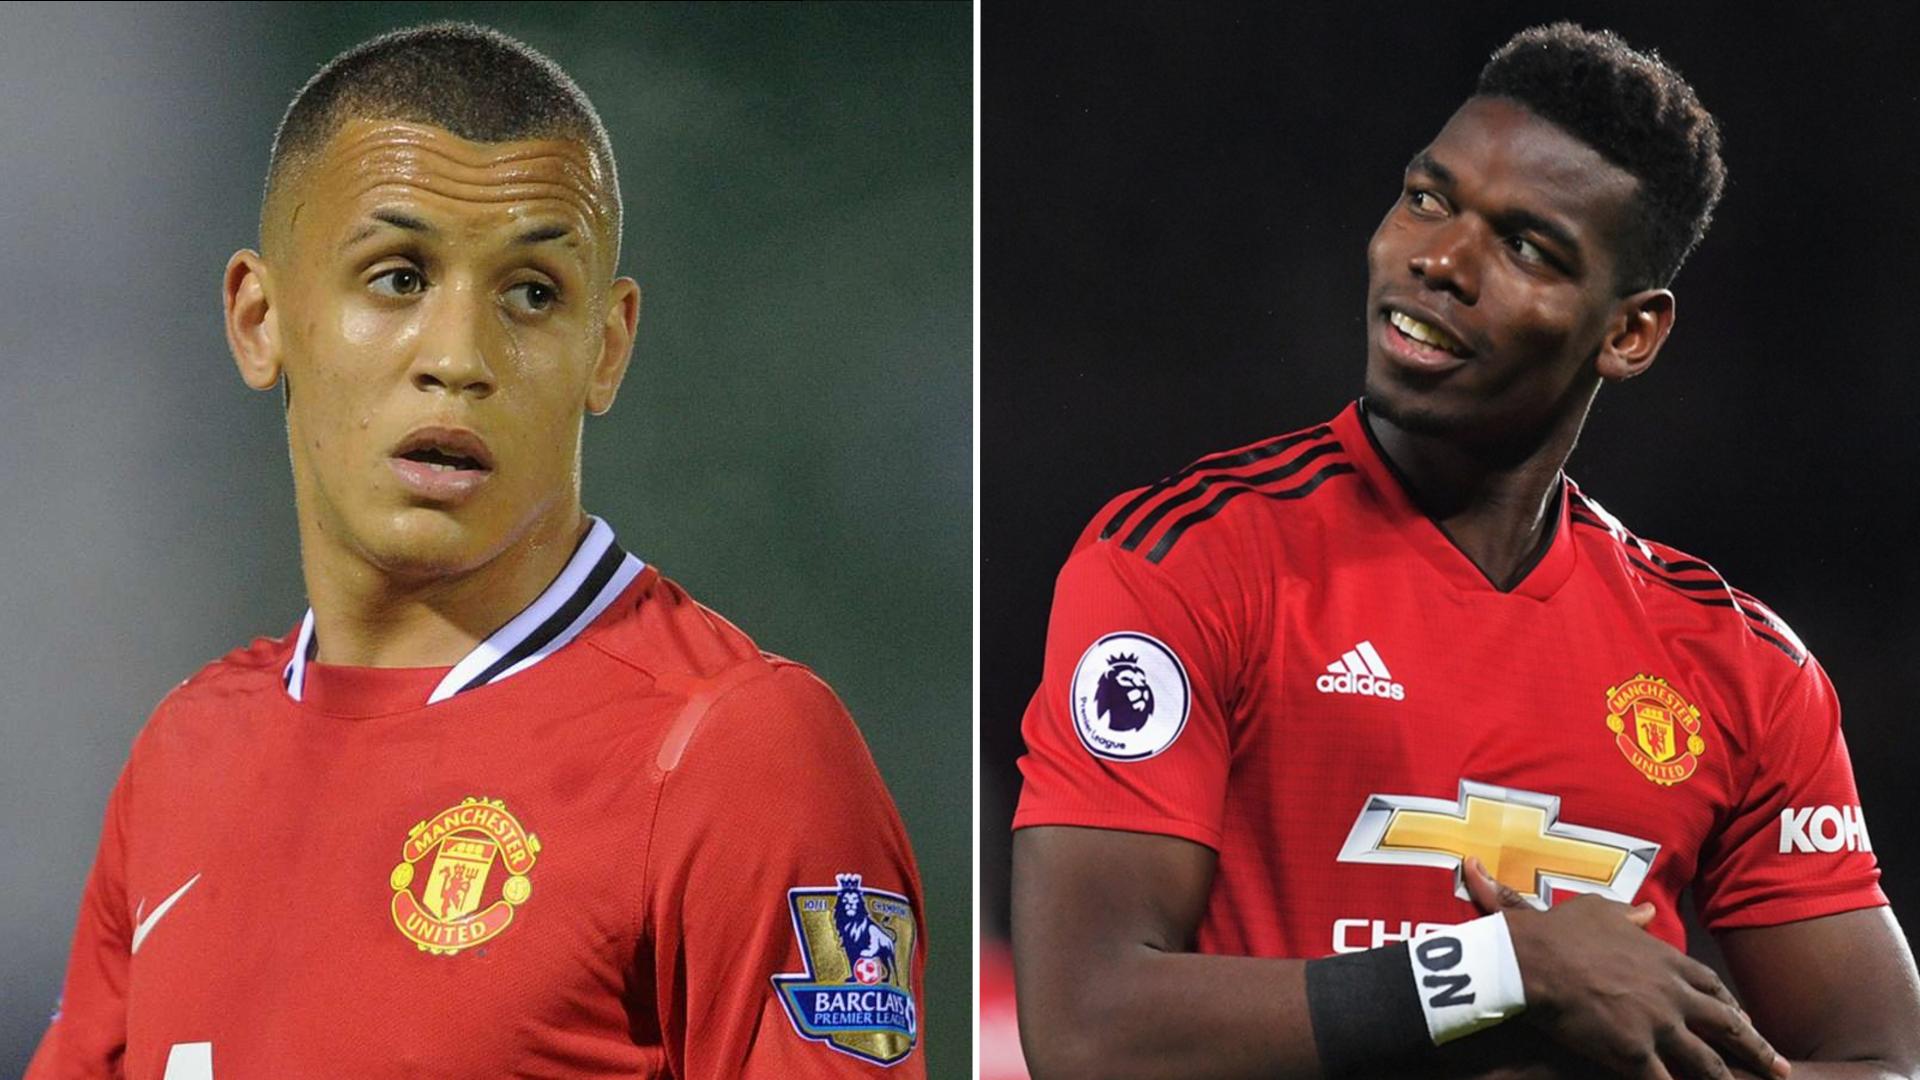 Wayne Rooney: Ravel Morrison was miles better than Paul Pogba